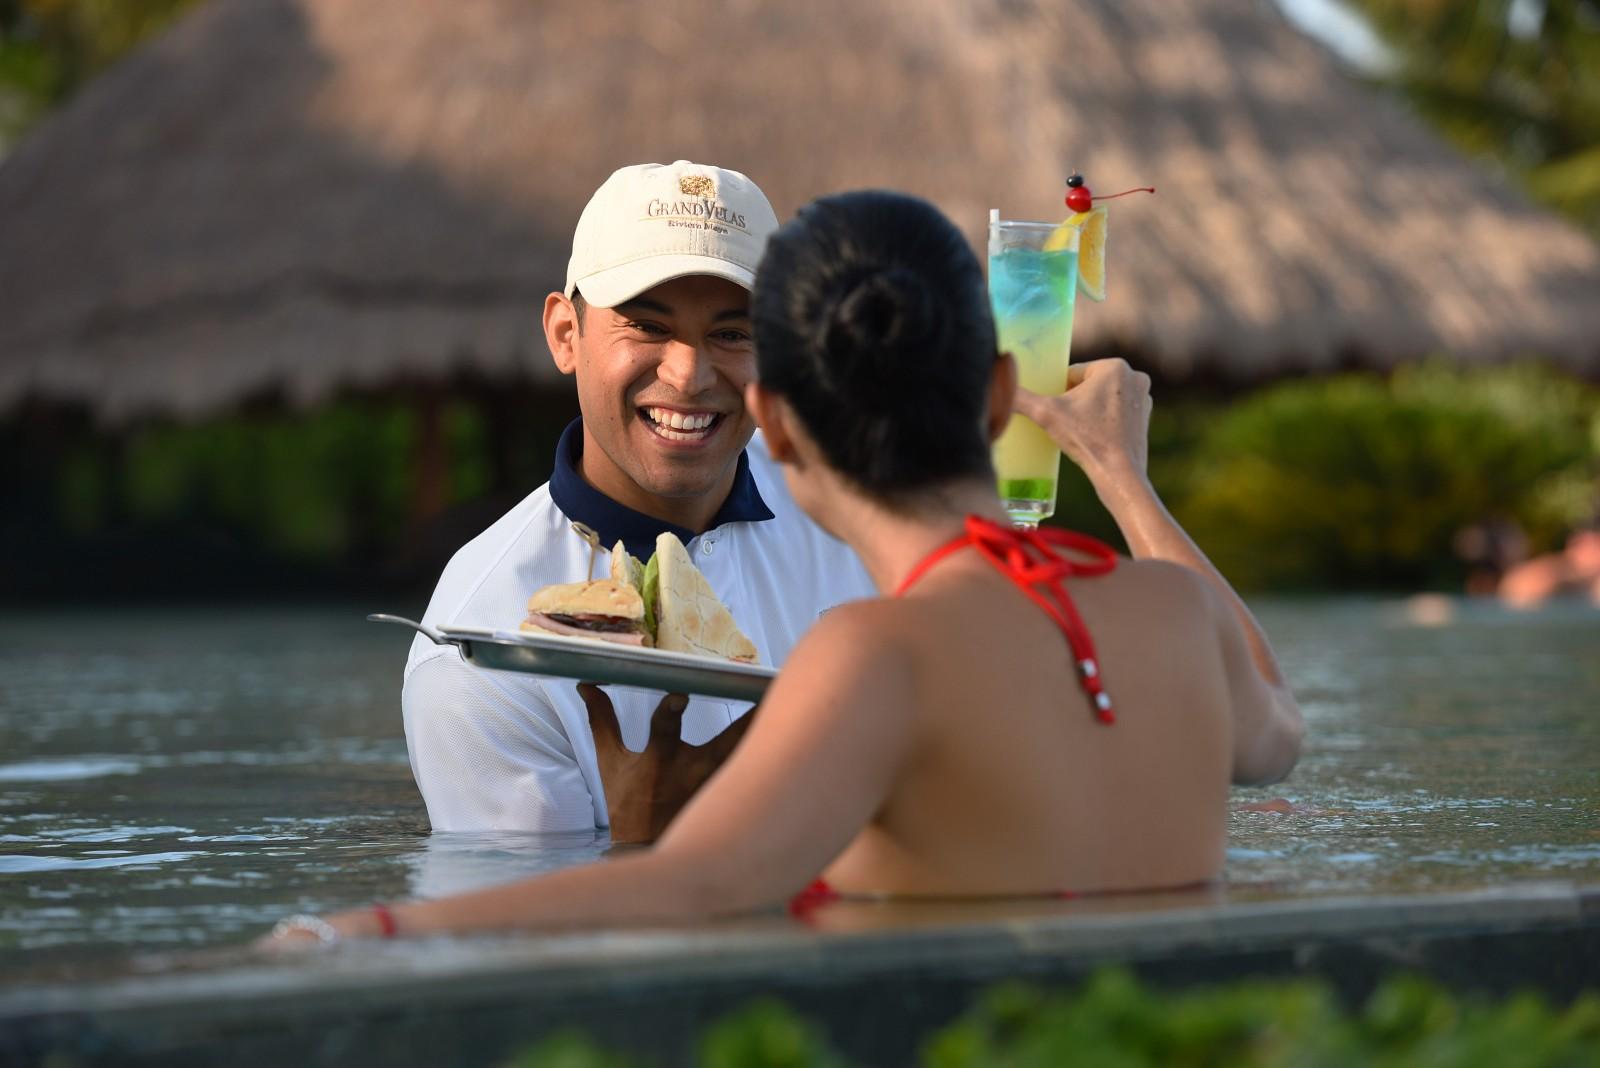 Travel Agency All-Inclusive Resort Grand Velas Riviera Maya 023